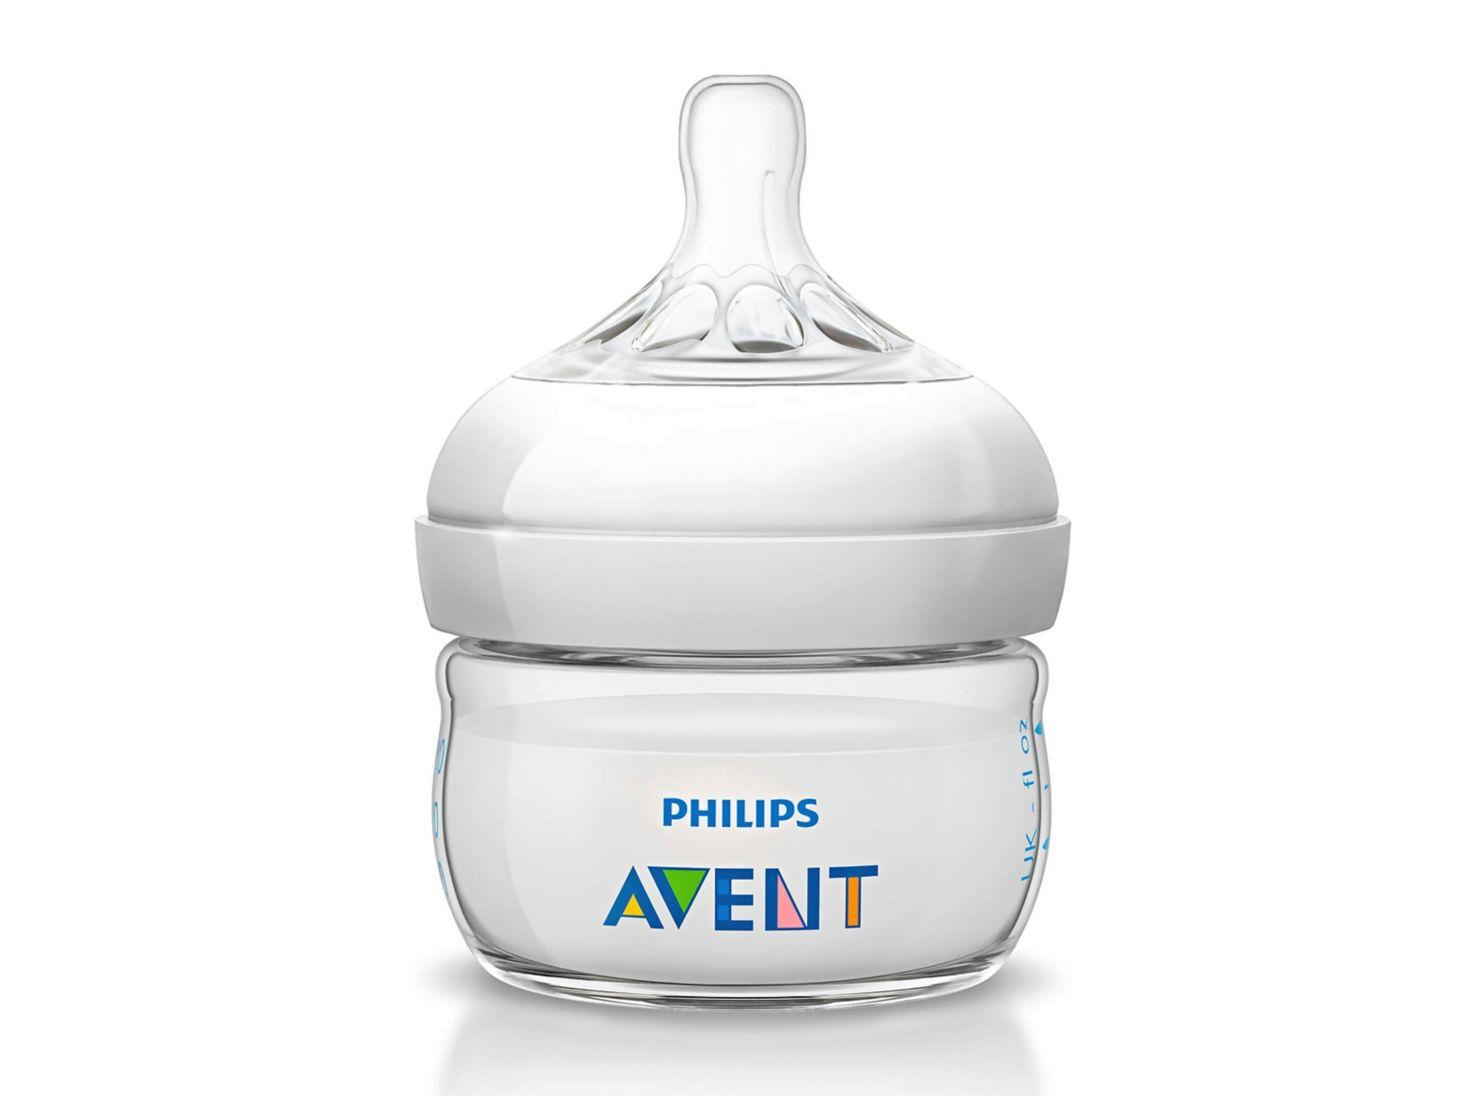 e7ea62ad9fe07 Mamadera Natural 60 ml Avent - Lactancia y Cuidado